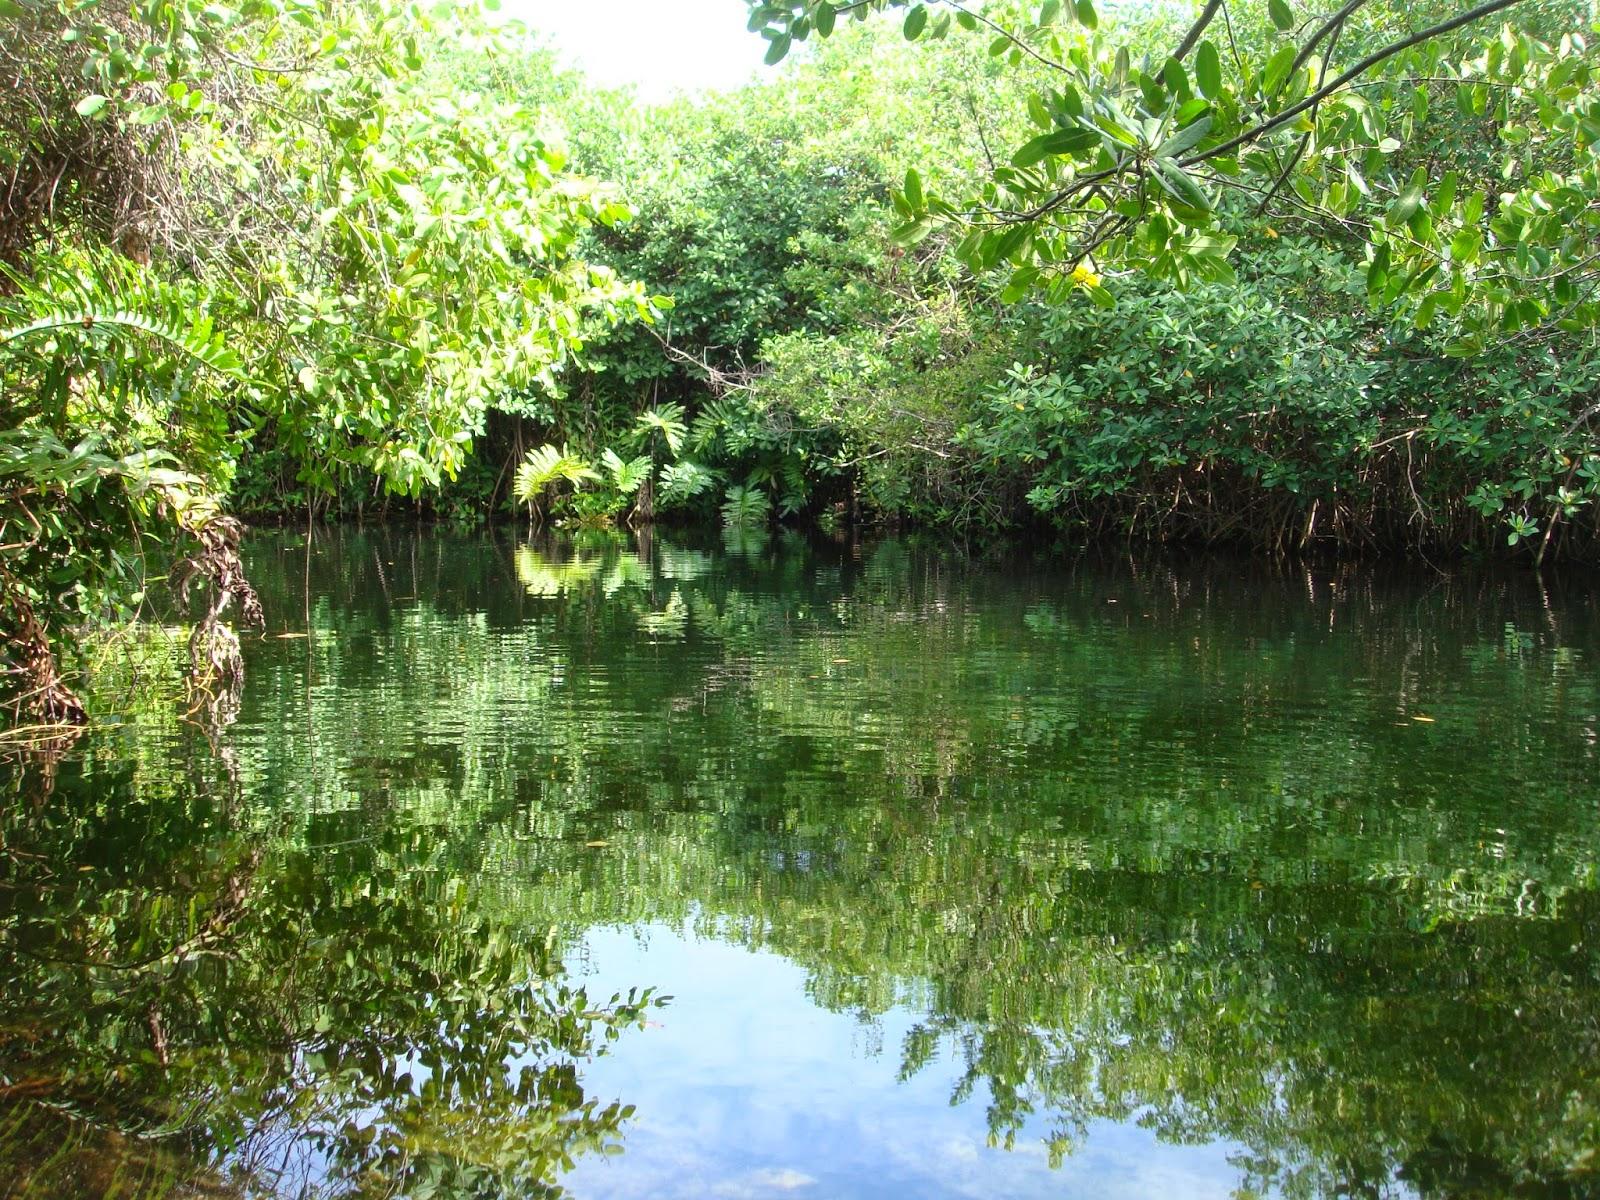 dicas viagem riviera maya xcacel